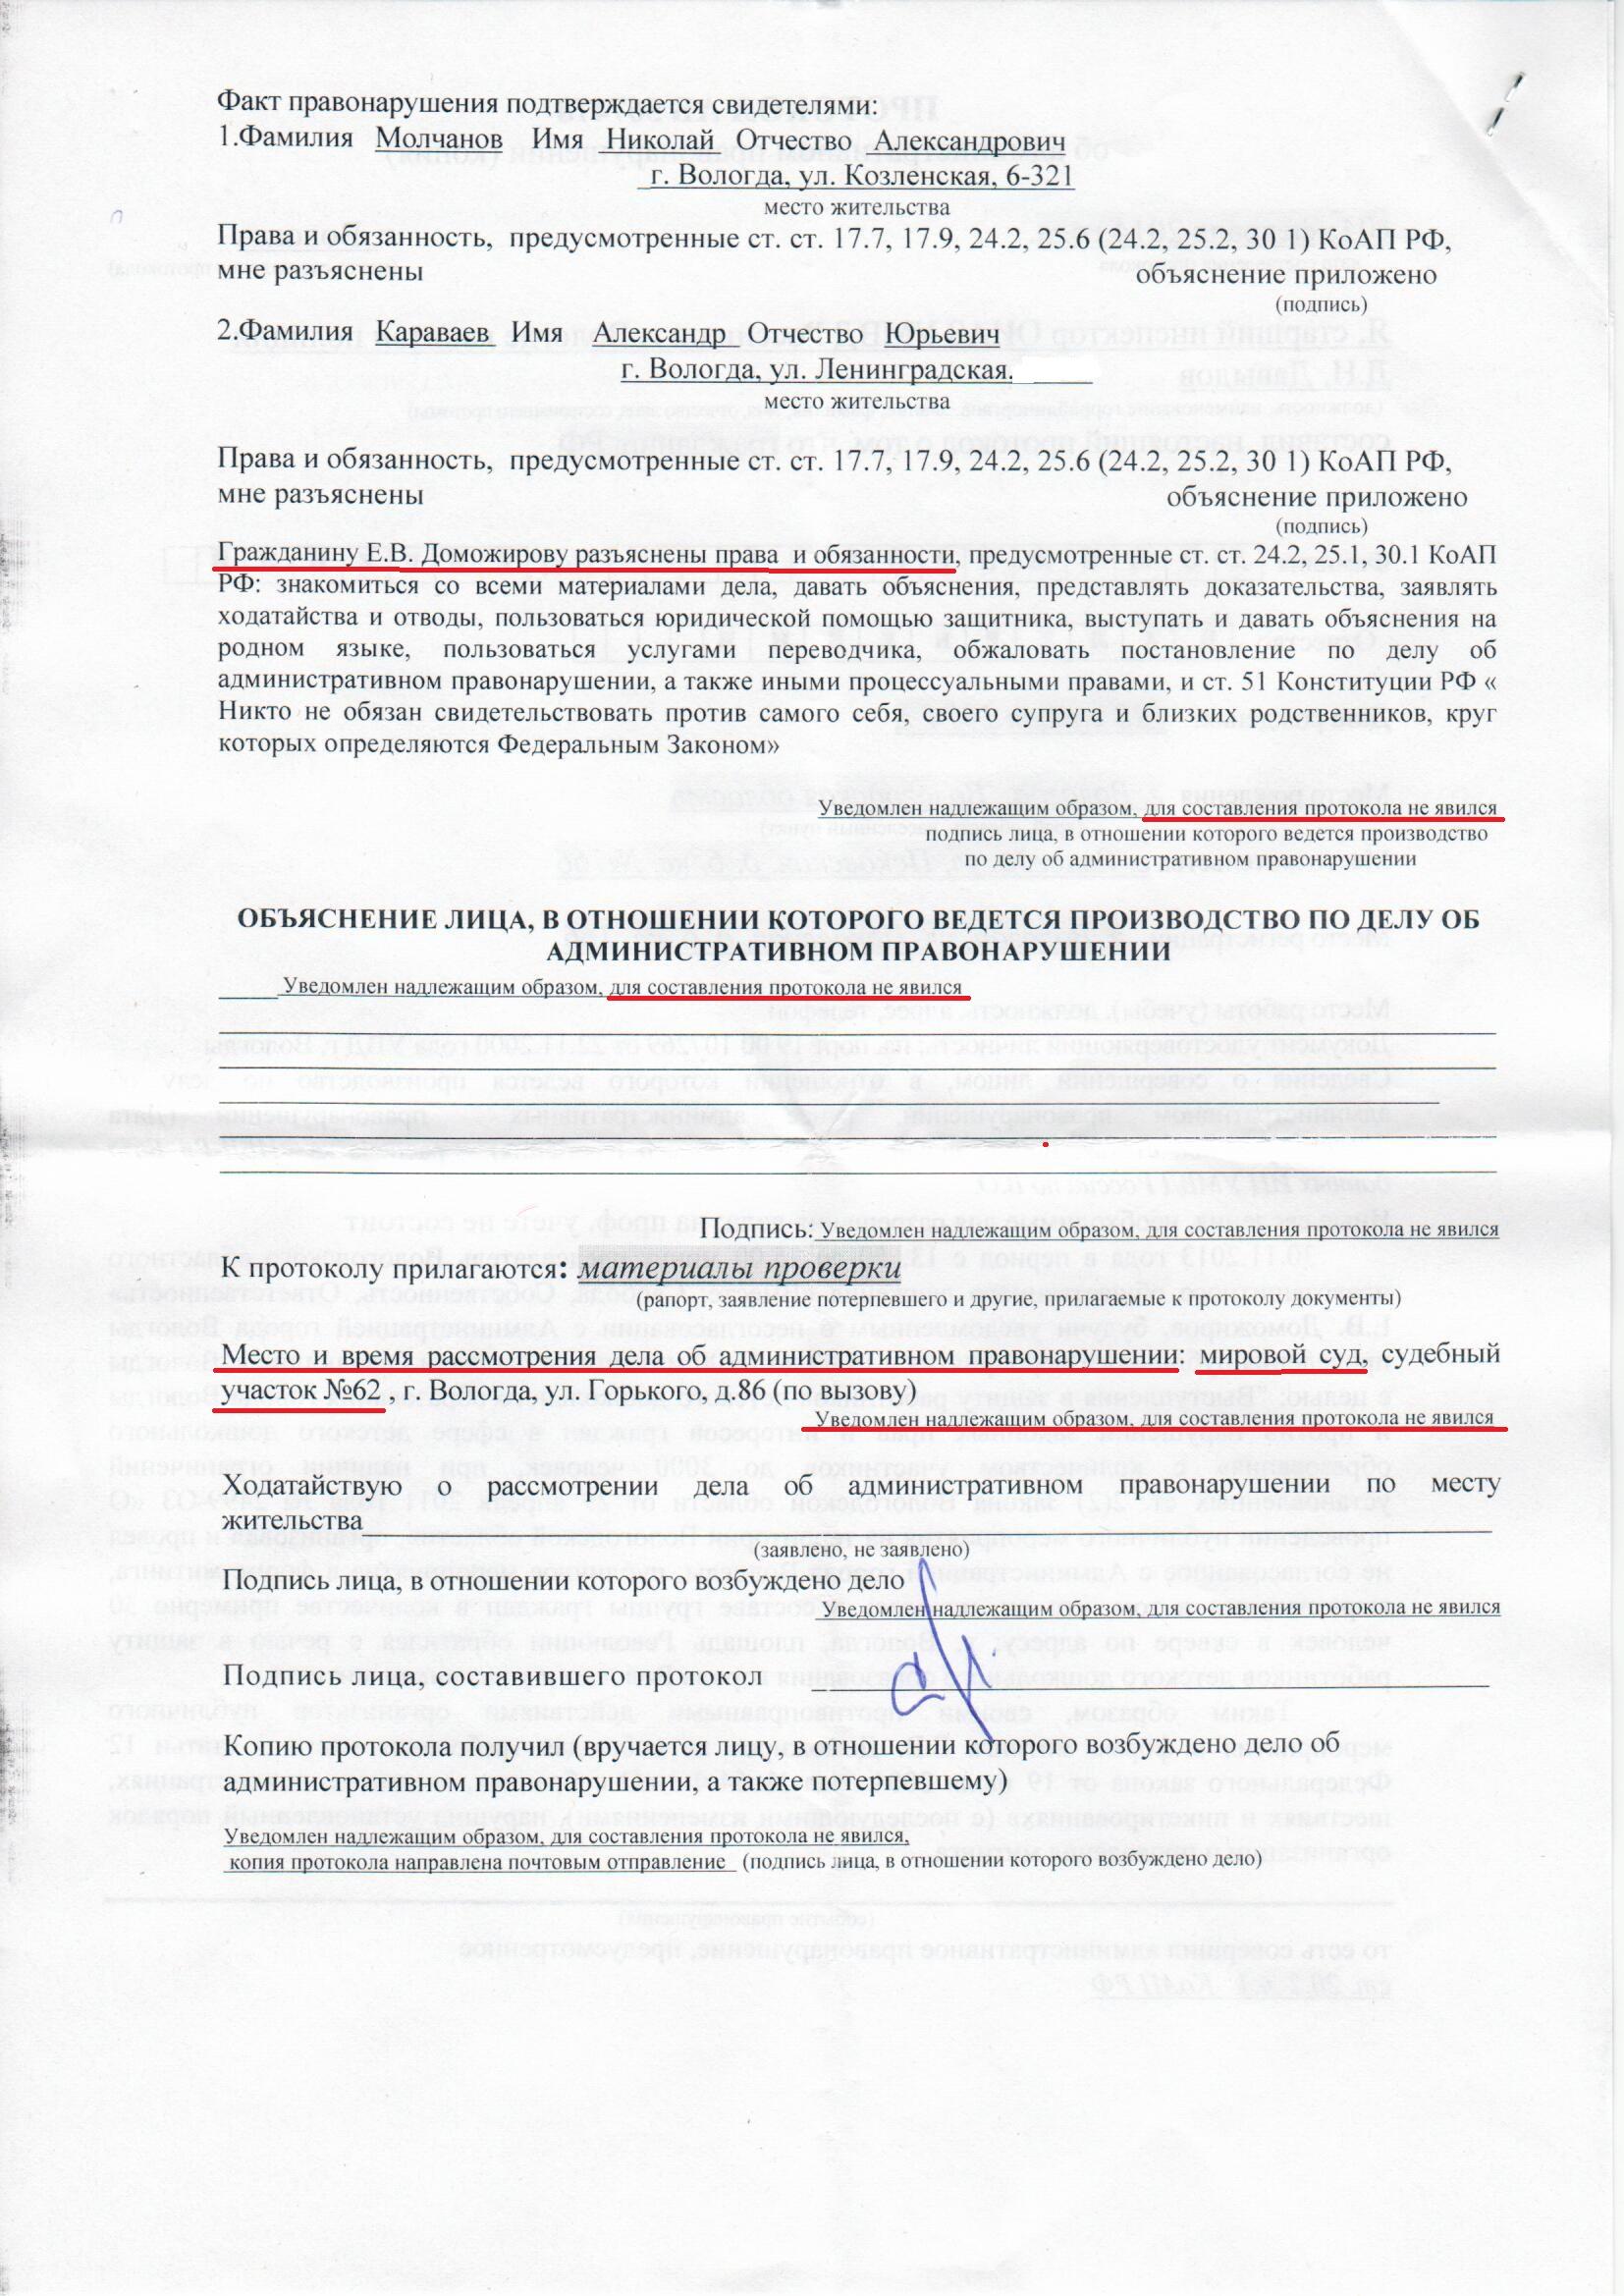 Протокол за митинг 30 ноября 2013 года стр.2